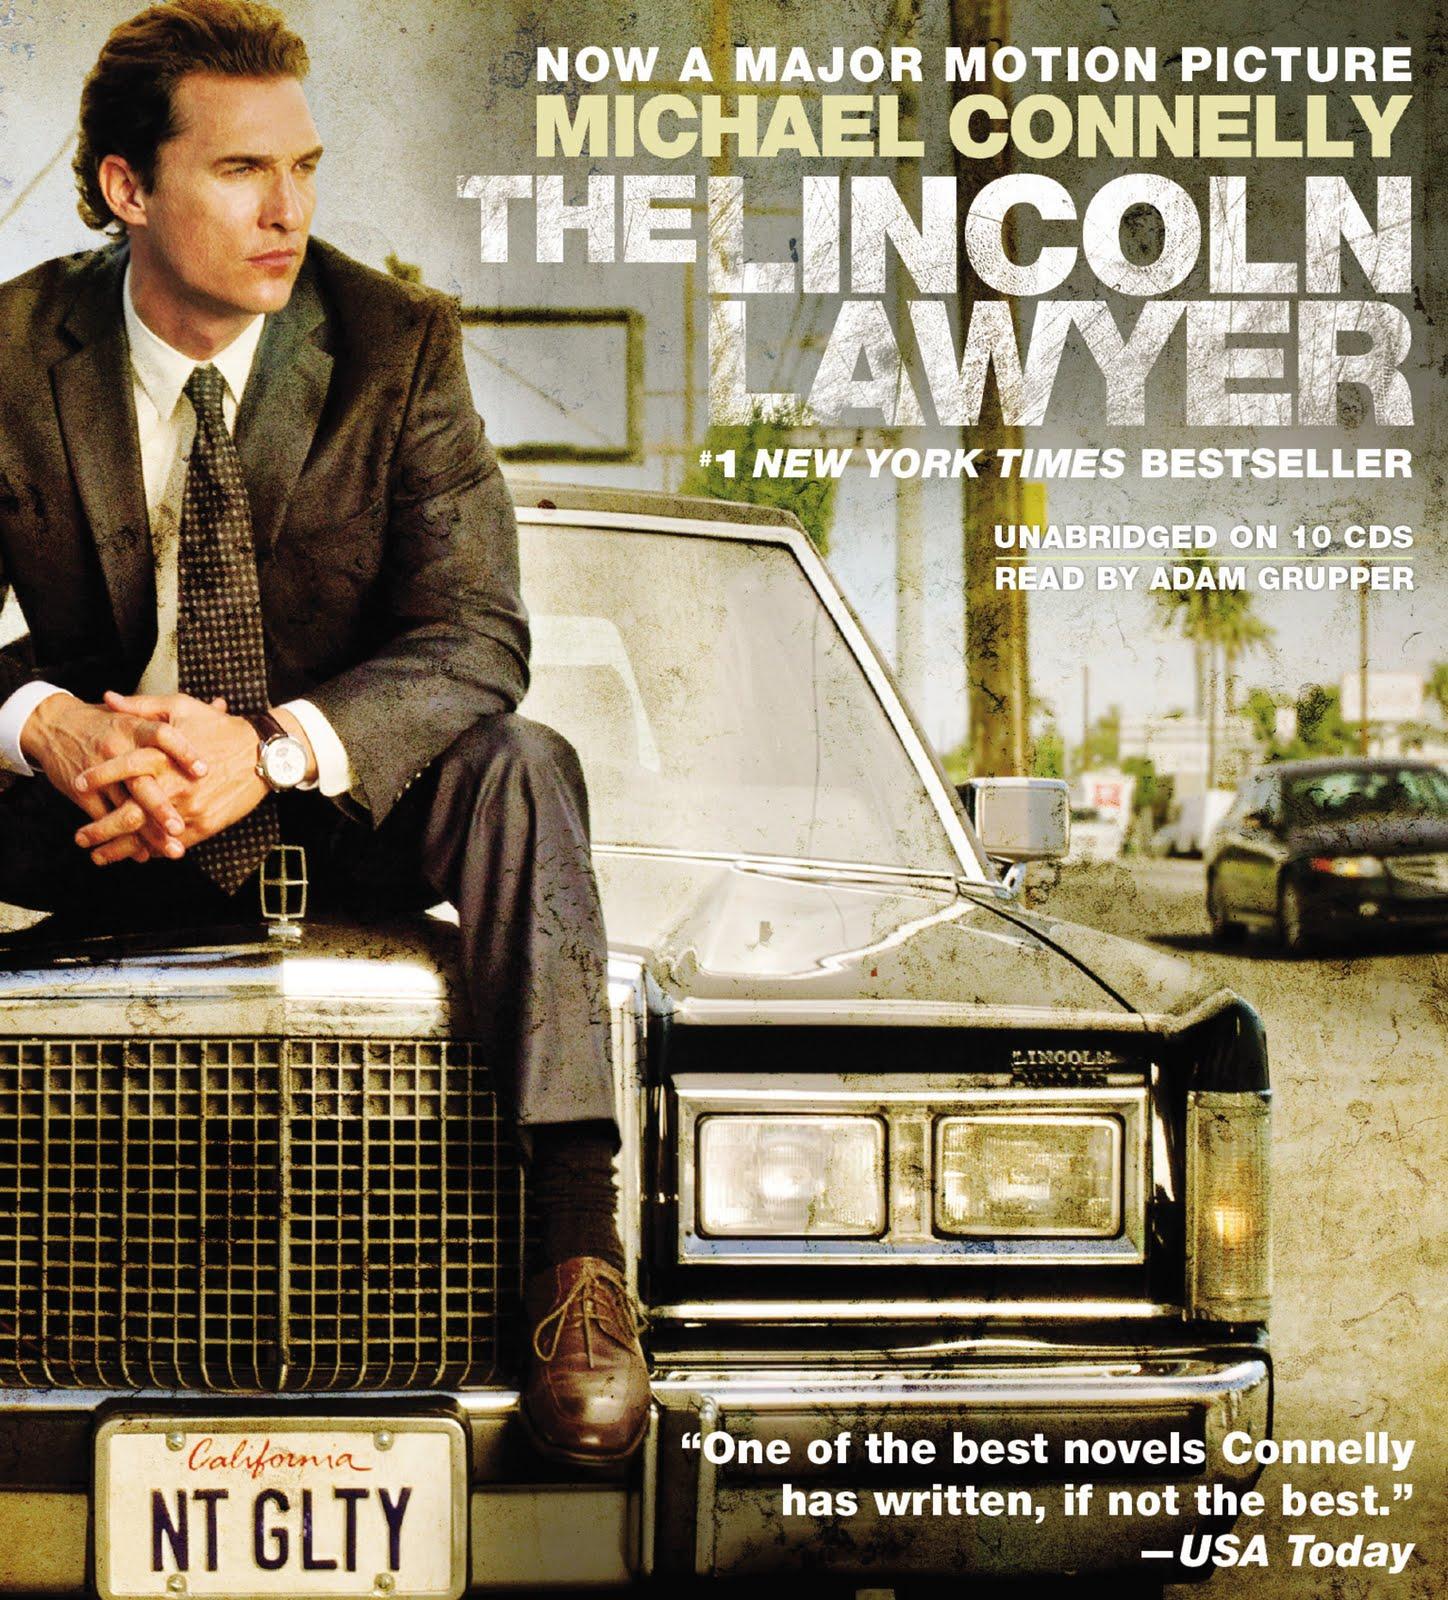 Lincoln Lawyer (2011)dvdplanetstorepk